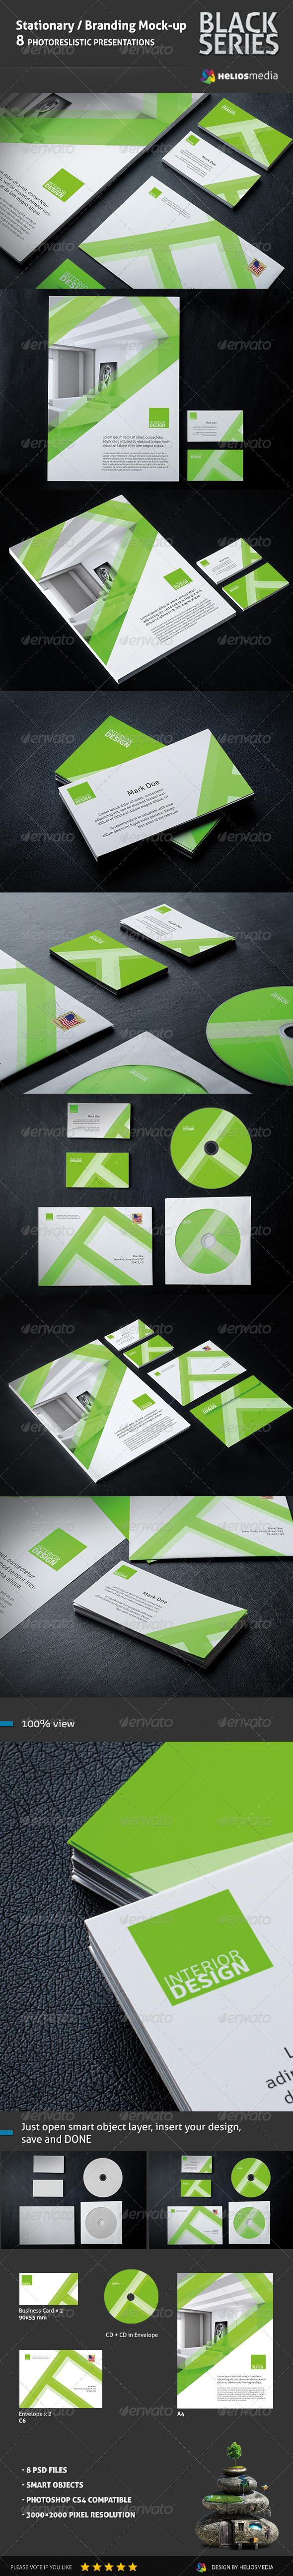 GraphicRiver Stationery Branding BlackSeries Mockup 5846707